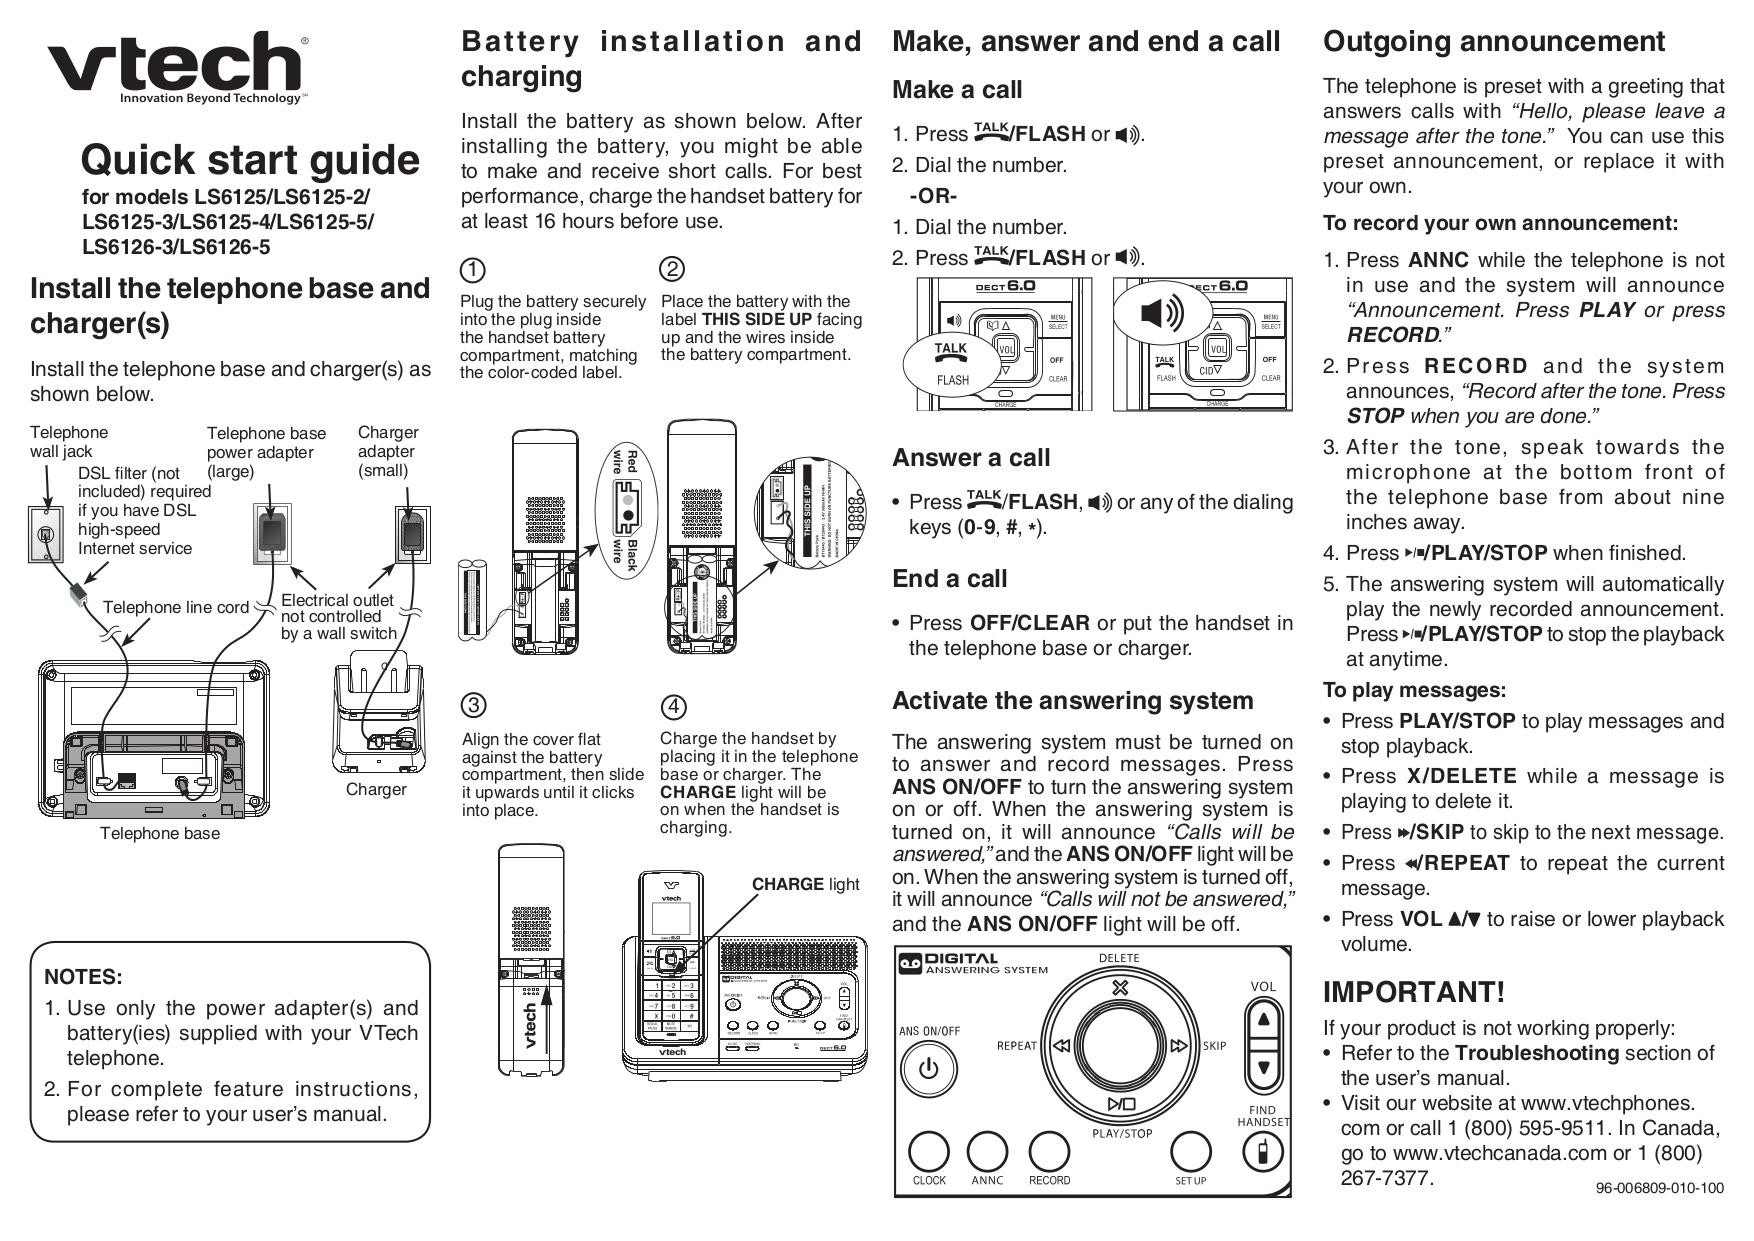 pdf for Vtech Telephone LS6125-2 manual